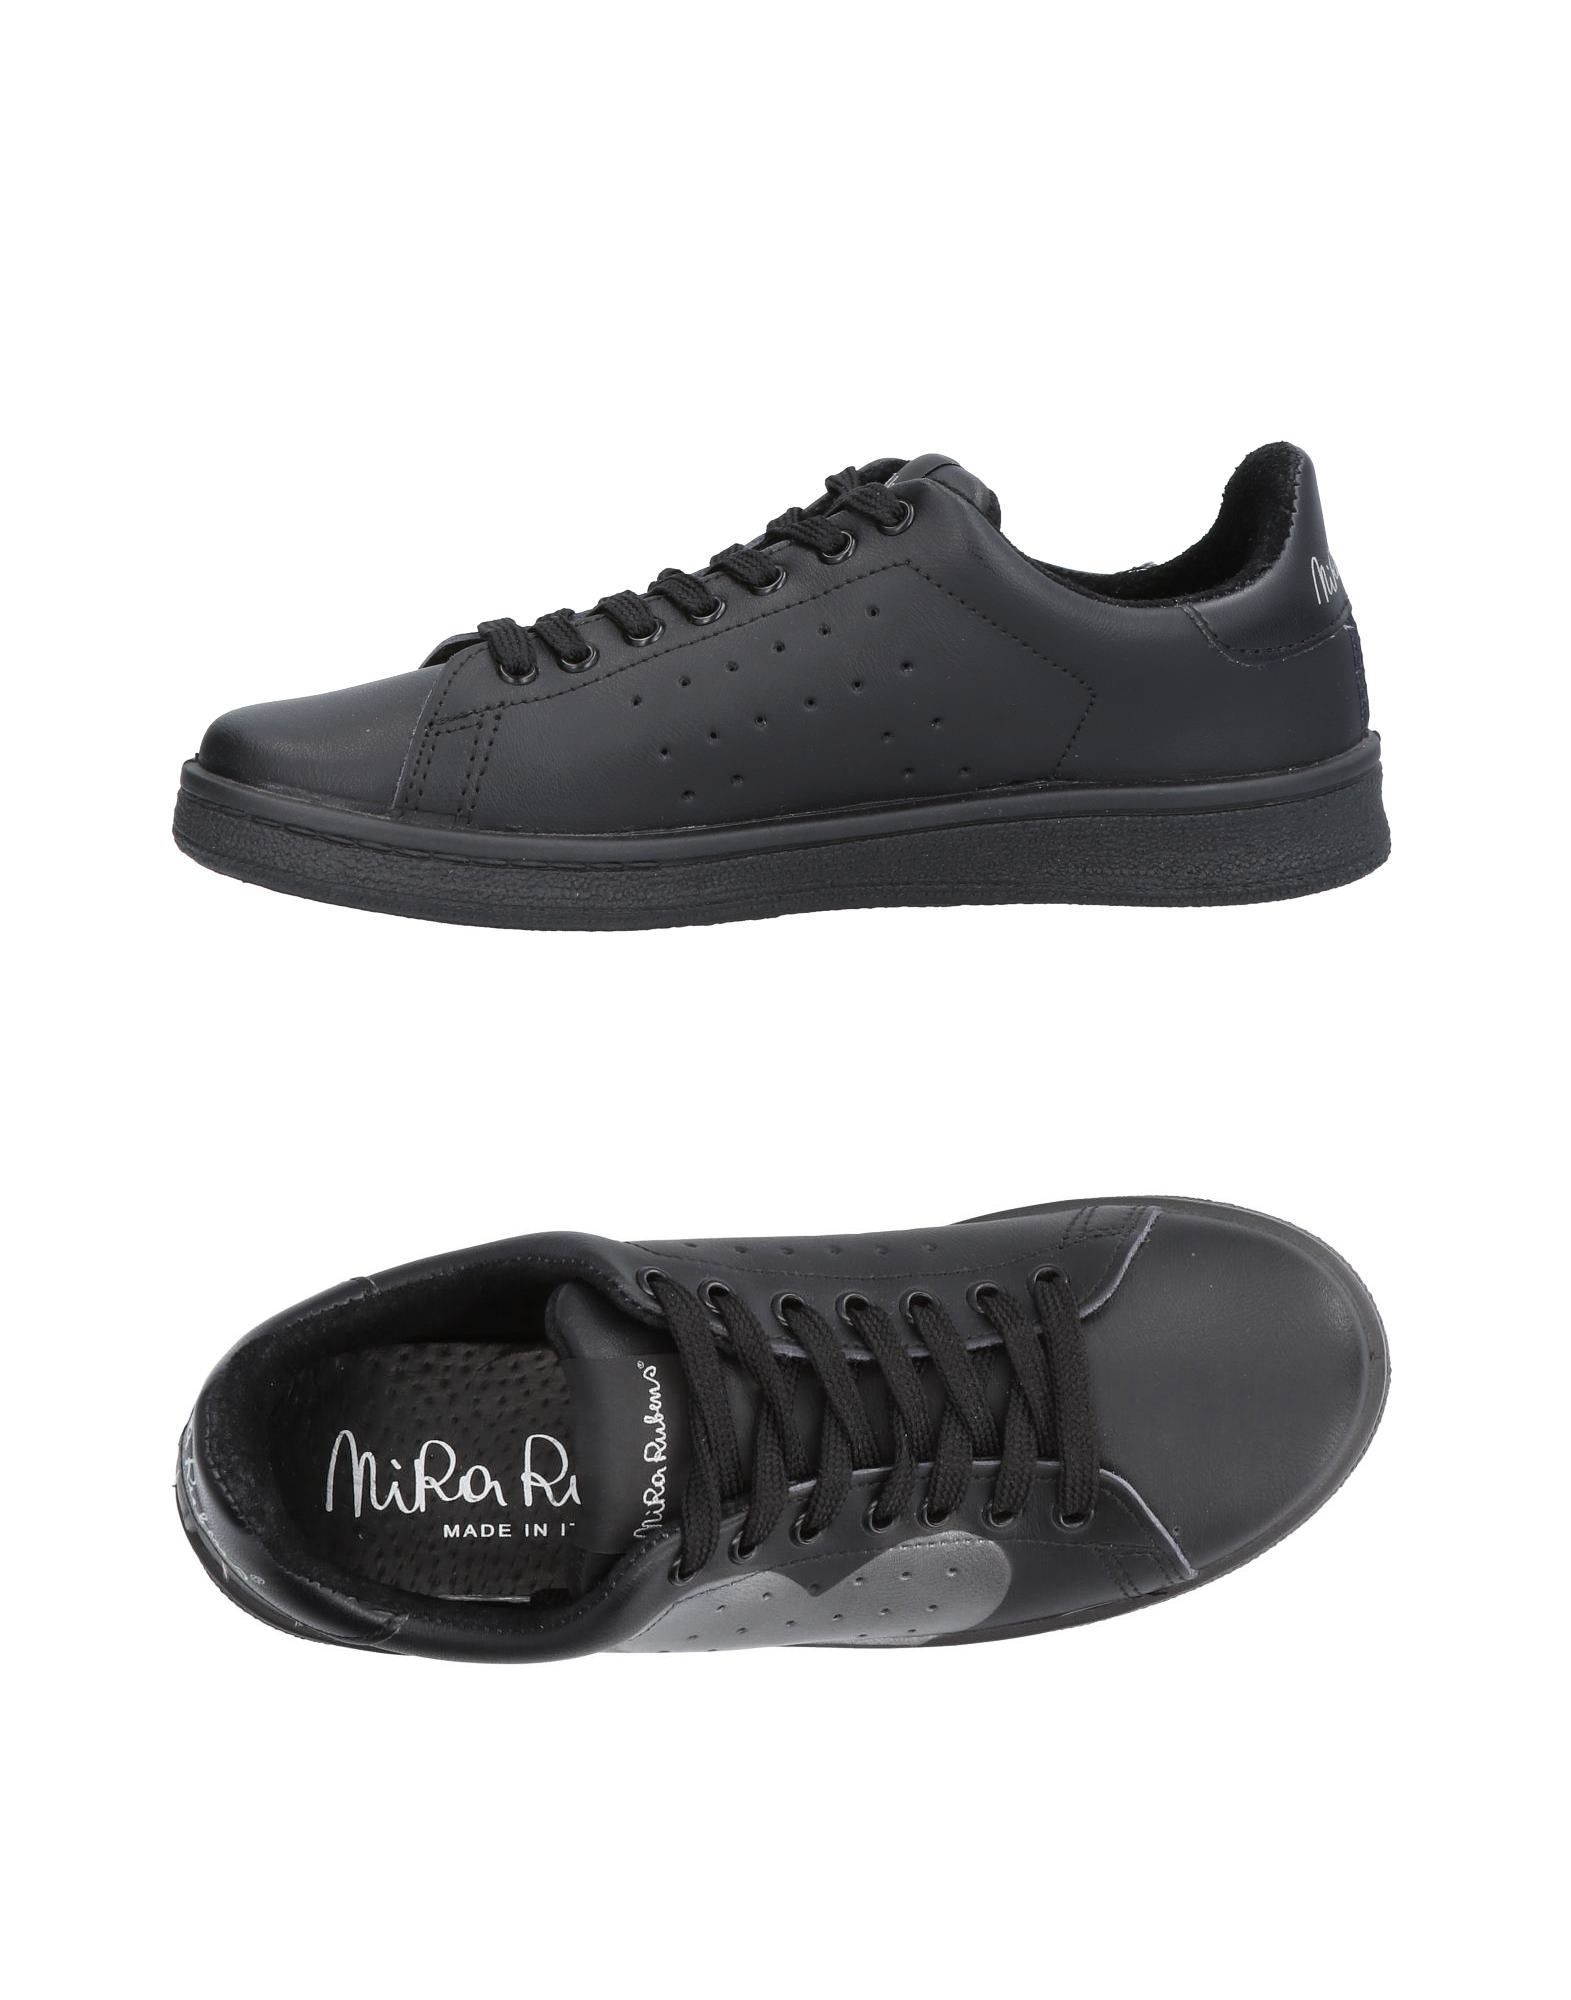 Nira Rubens Sneakers Damen  11482660MD 11482660MD  Neue Schuhe 808f4c